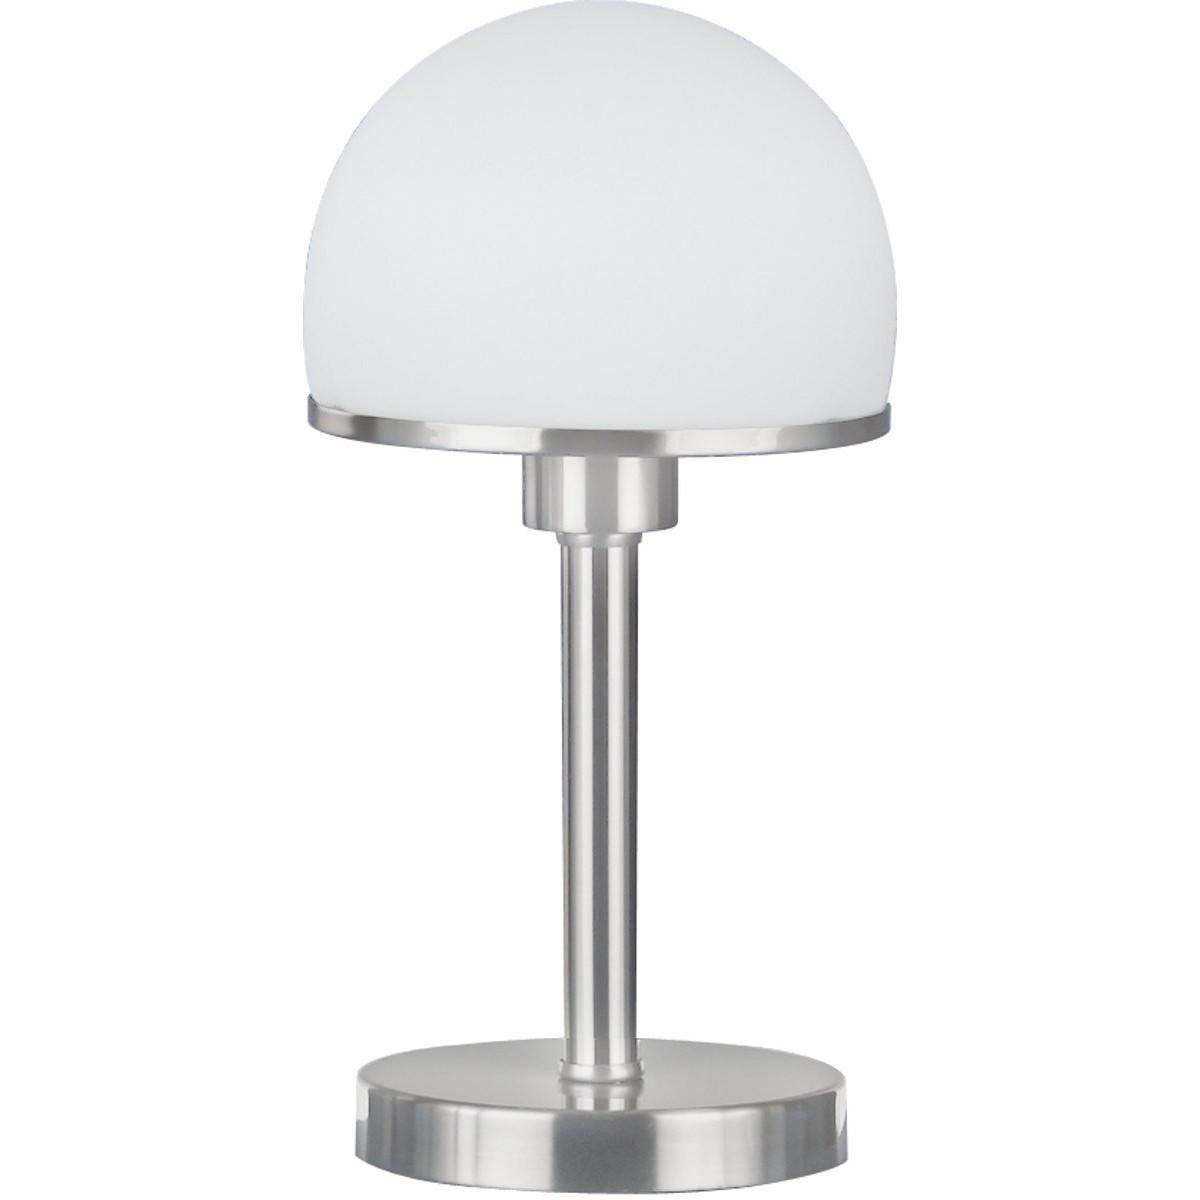 LED Tafellamp - Trion Josa - E27 Fitting - Dimbaar - Rond - Mat Nikkel - Aluminium